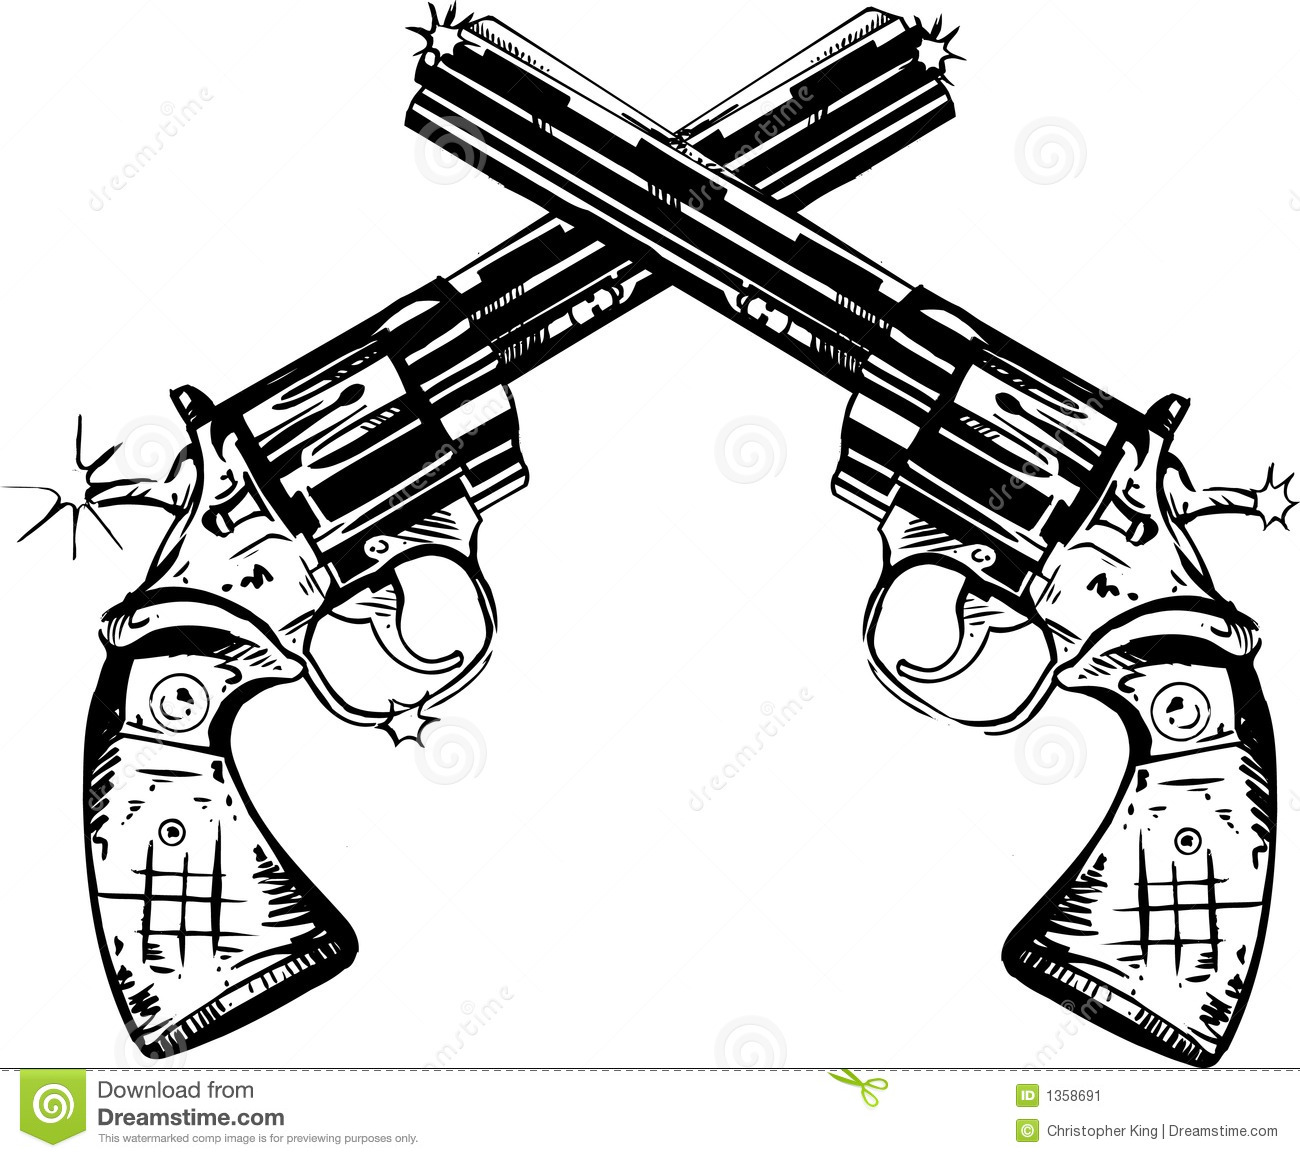 Pen And Ink Illustration Of Two Magnum Pistols Mr No Pr No 5 4532 36